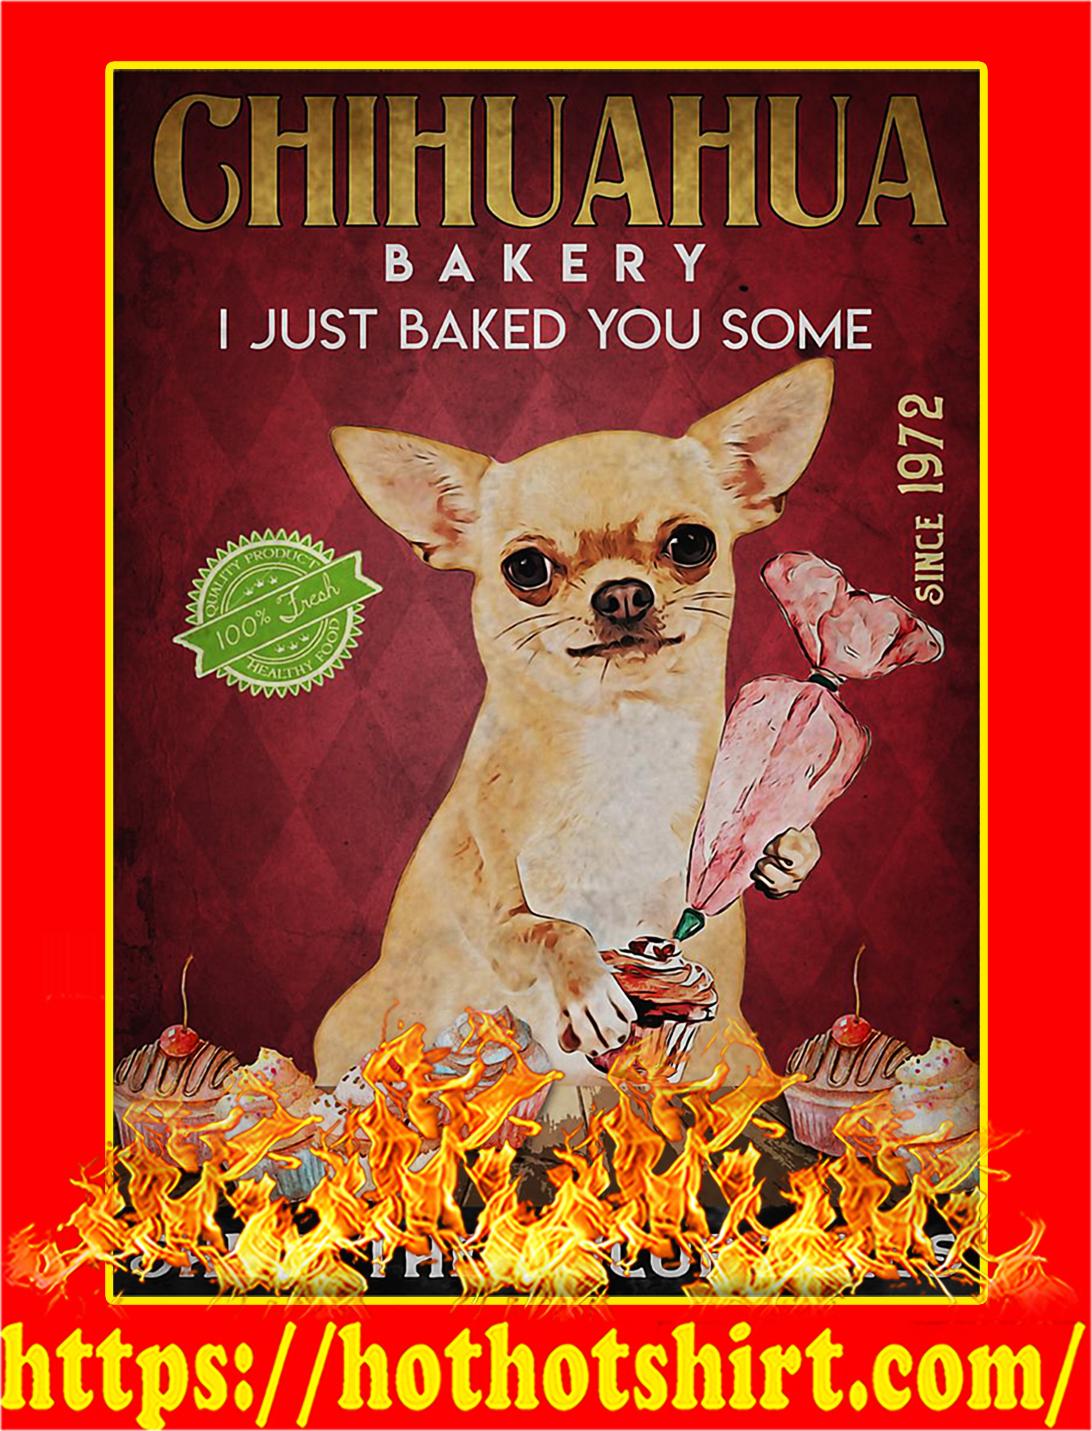 Chihuahua bakery shut the fucupcakes poster - A1